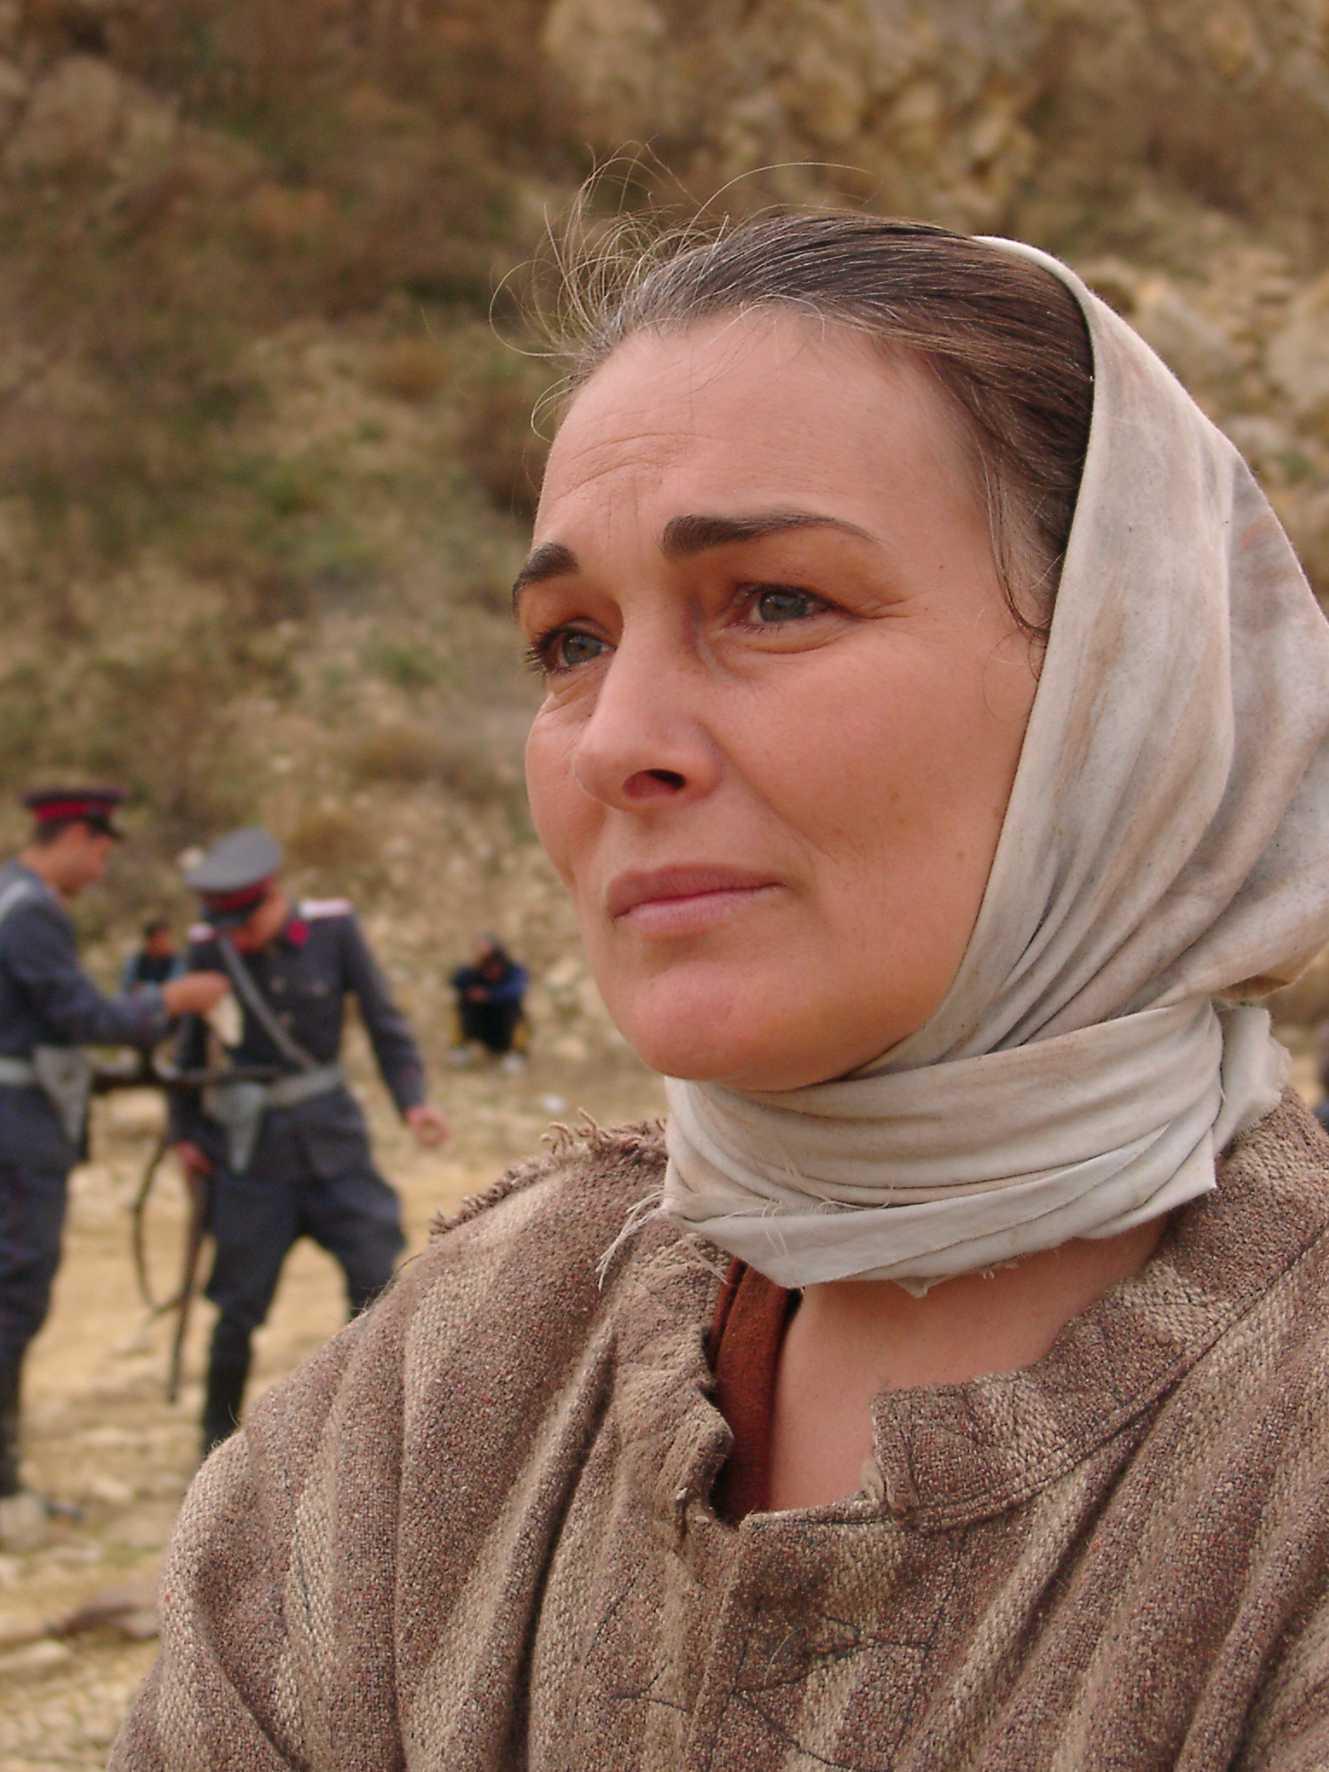 "<i>""NE-AM DAT LA CAINI""</i>. <b>Interviu exceptional cu actrita MARIA PLOAE despre jertfa martirilor din inchisori</b>. <i>""TRECEM USOR PESTE CEEA CE N-AR TREBUI SA TRECEM""</i>"